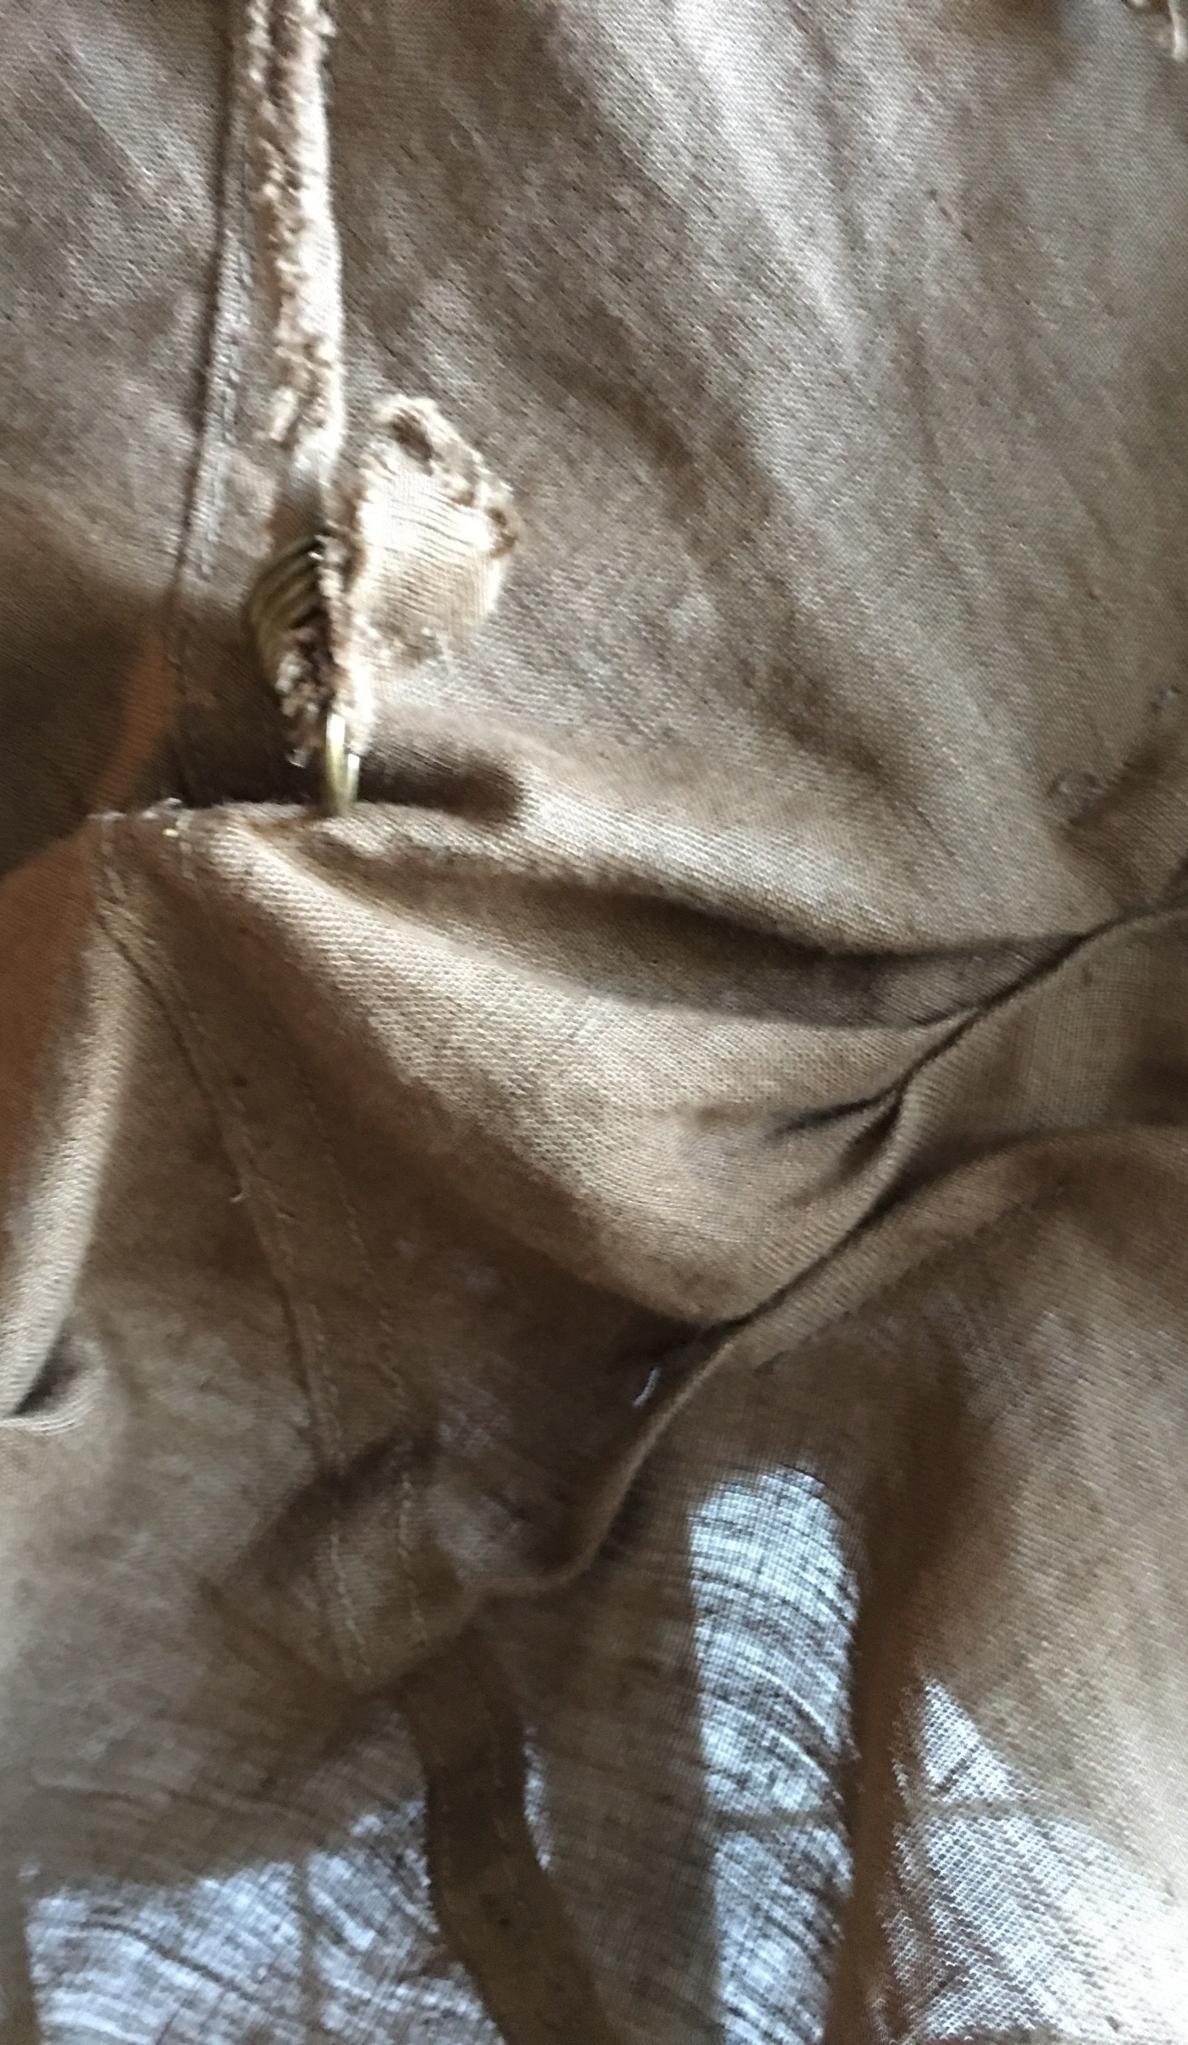 tucks on brown dress at hem.jpg